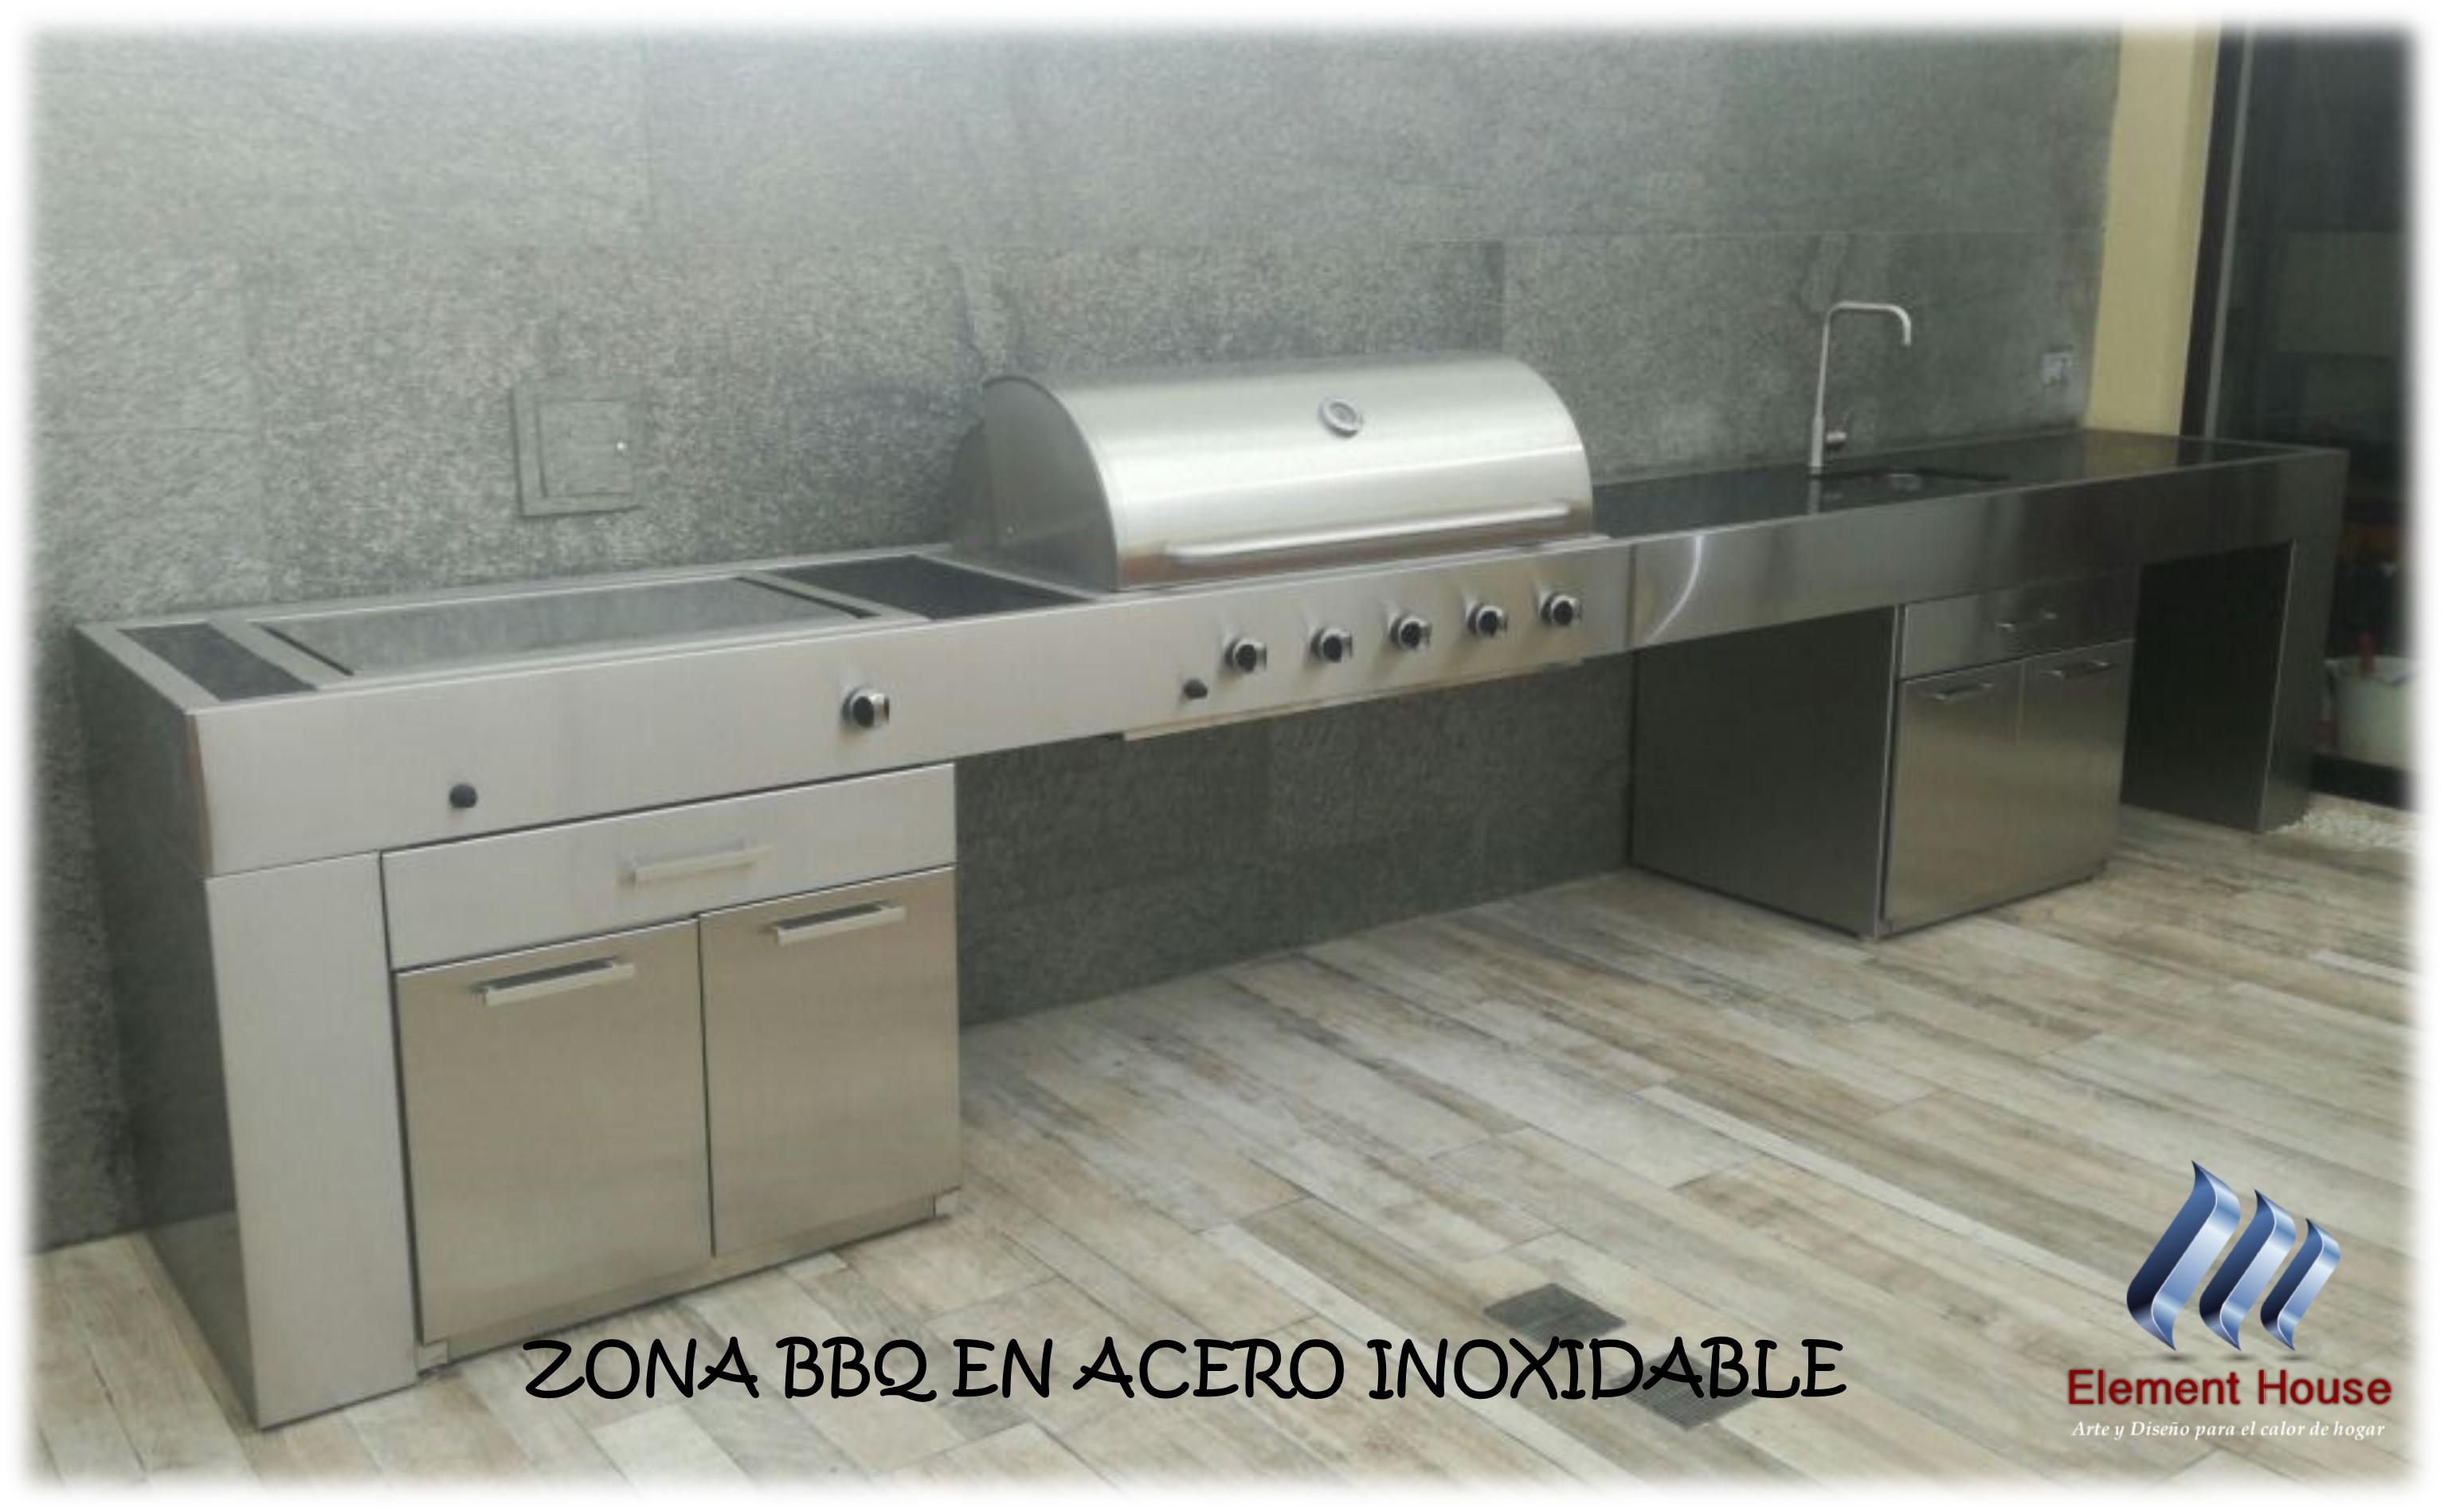 BBQ ELEMENT HOUSE (1)